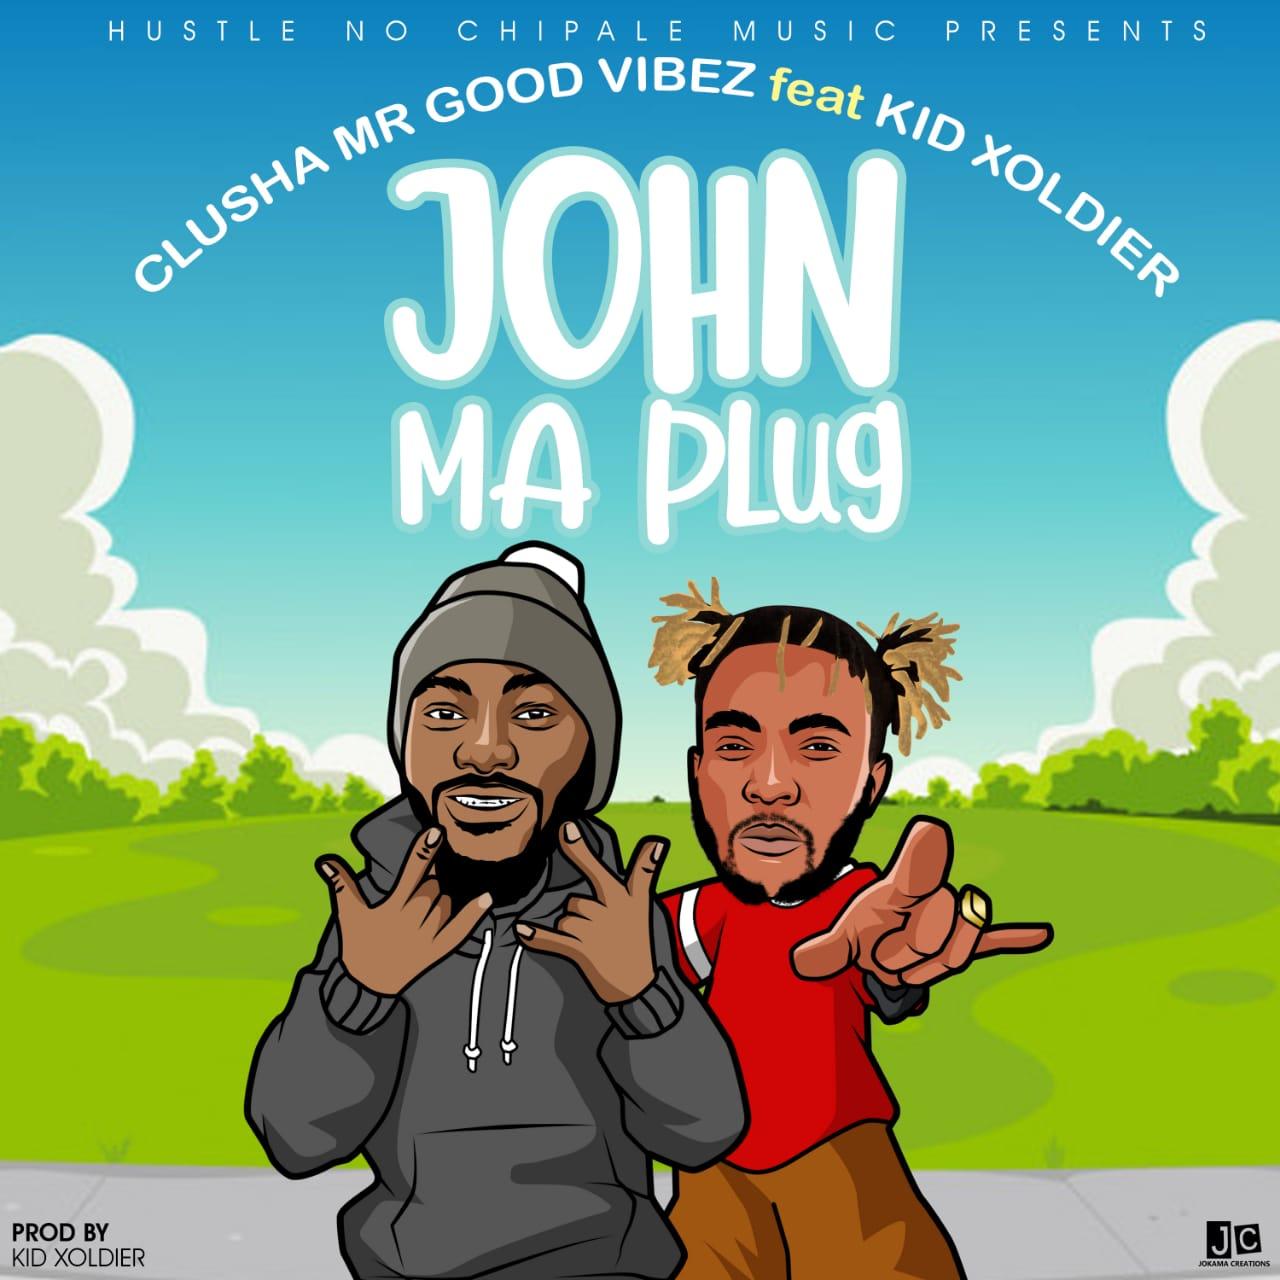 Clusha MrGoodVibez ft. Kid Xoldier - John Ma Plug